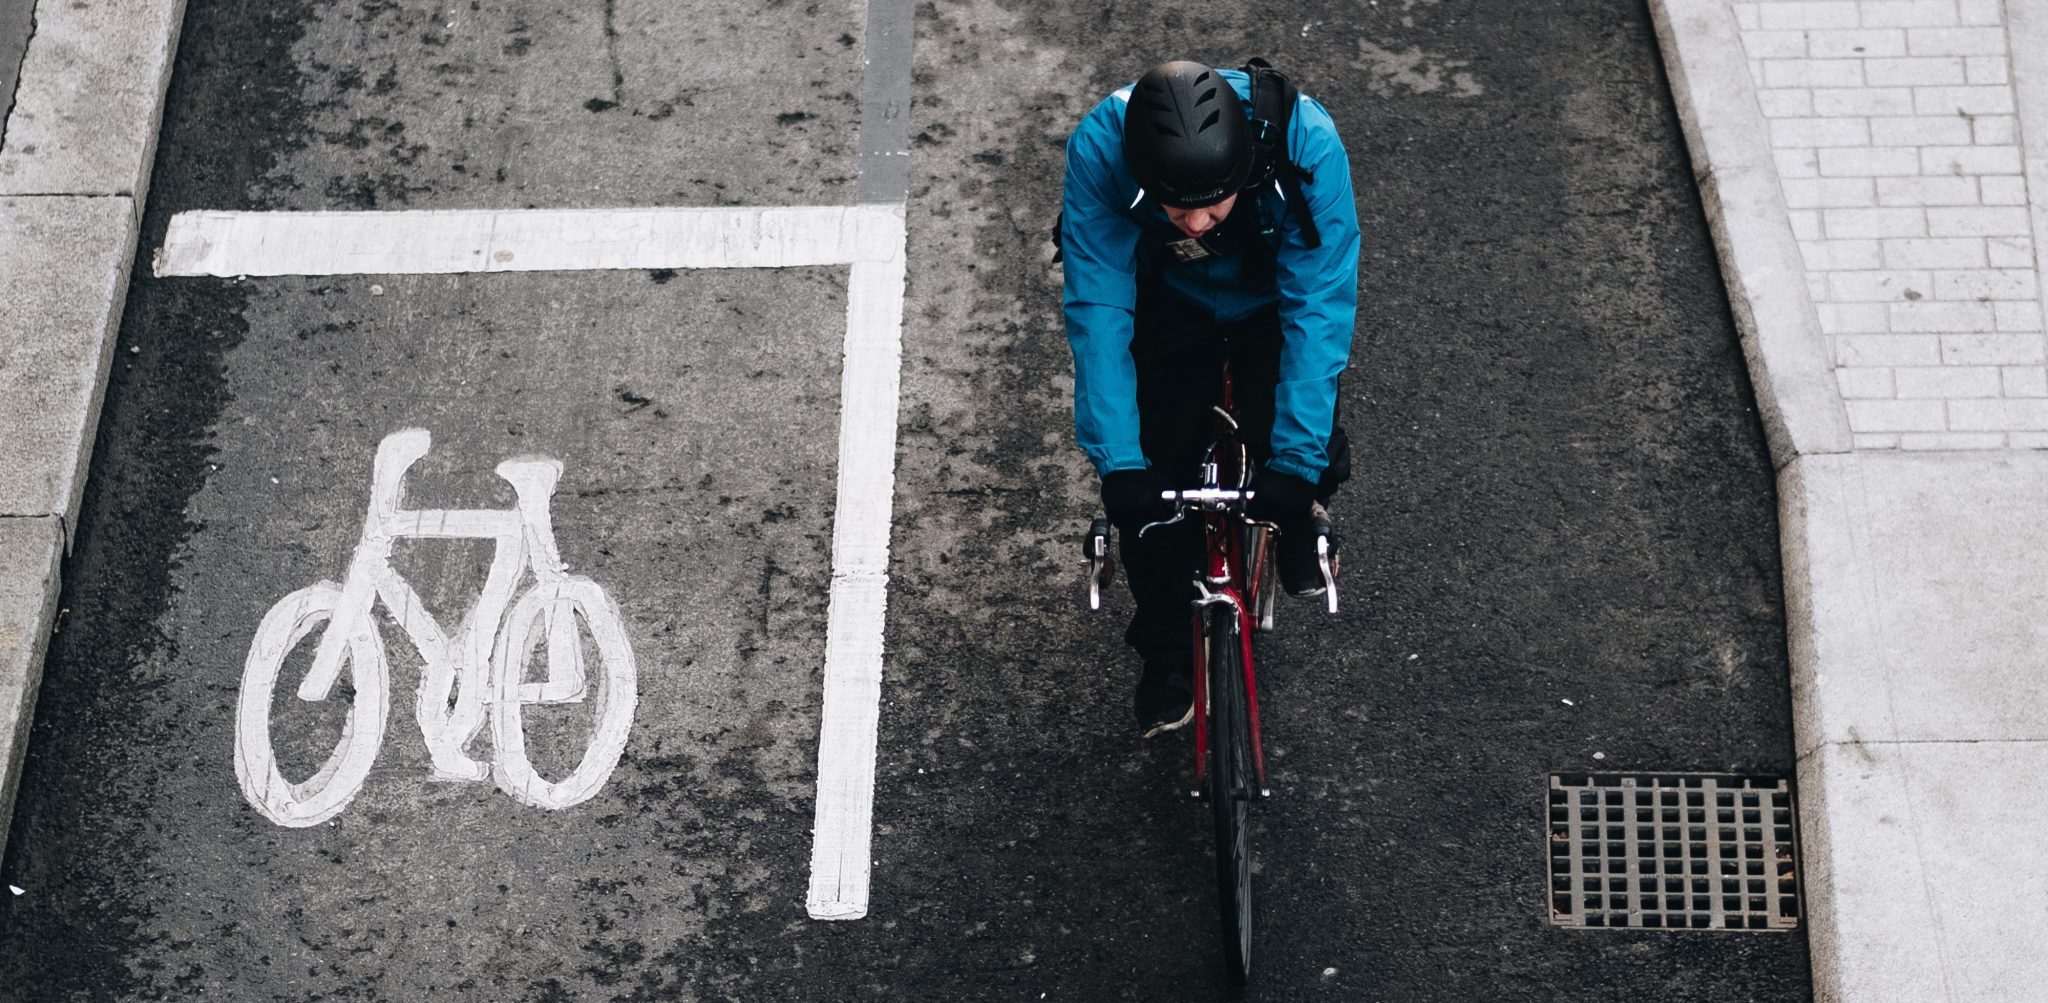 Cold Weather Biking - Biking in the Snow